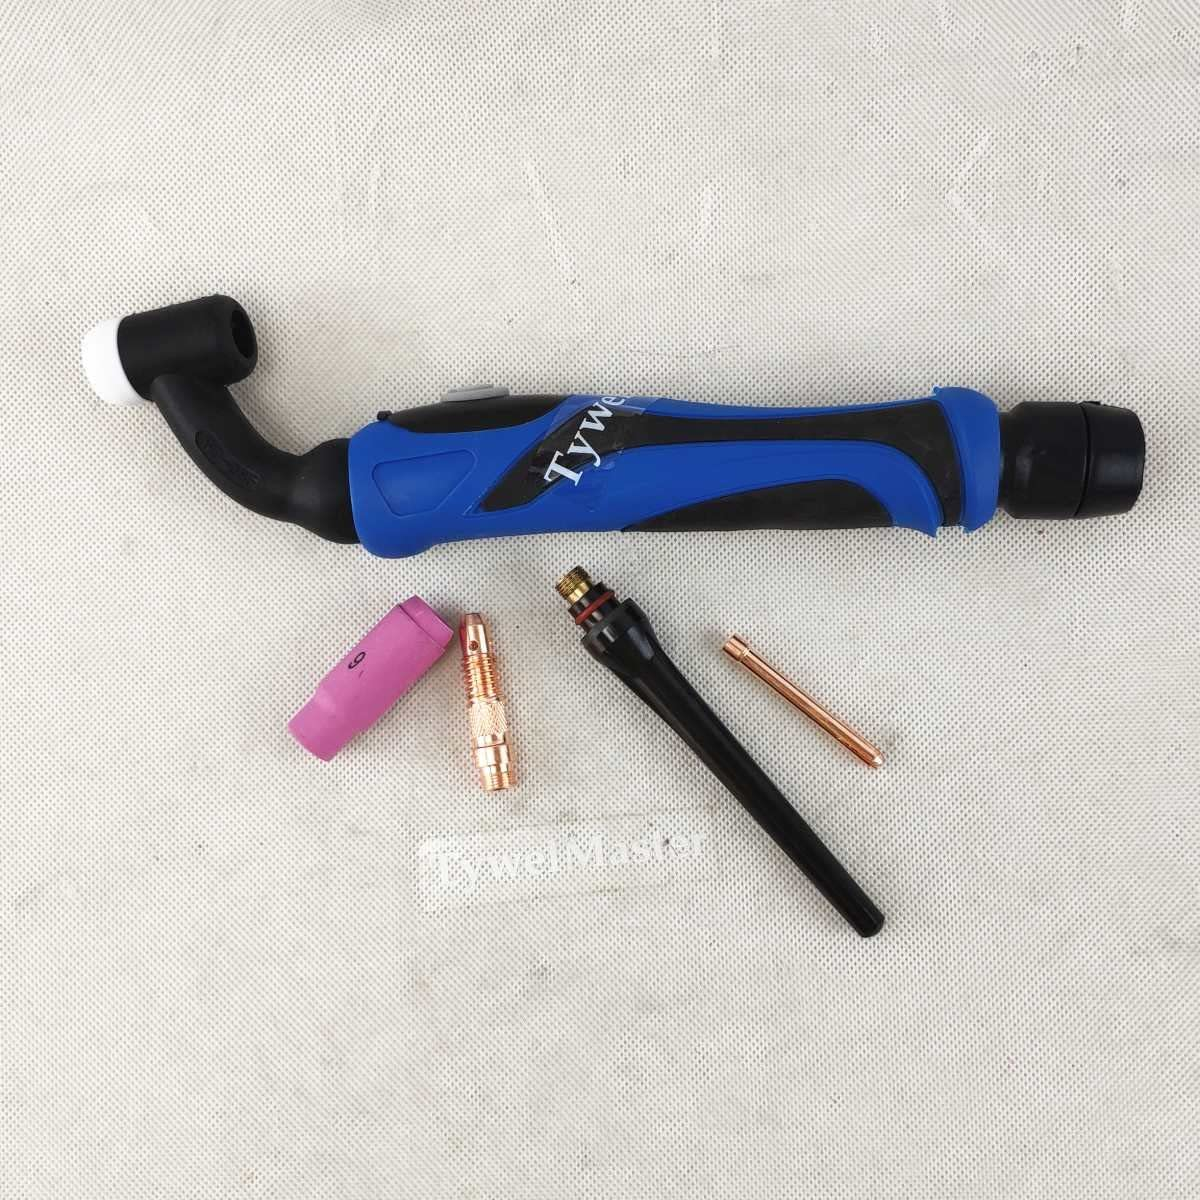 Professional WP26 TIG Welding Torch Body WP-26 WP26V WP-26F WP26FV A-200 GTAW Torch Head